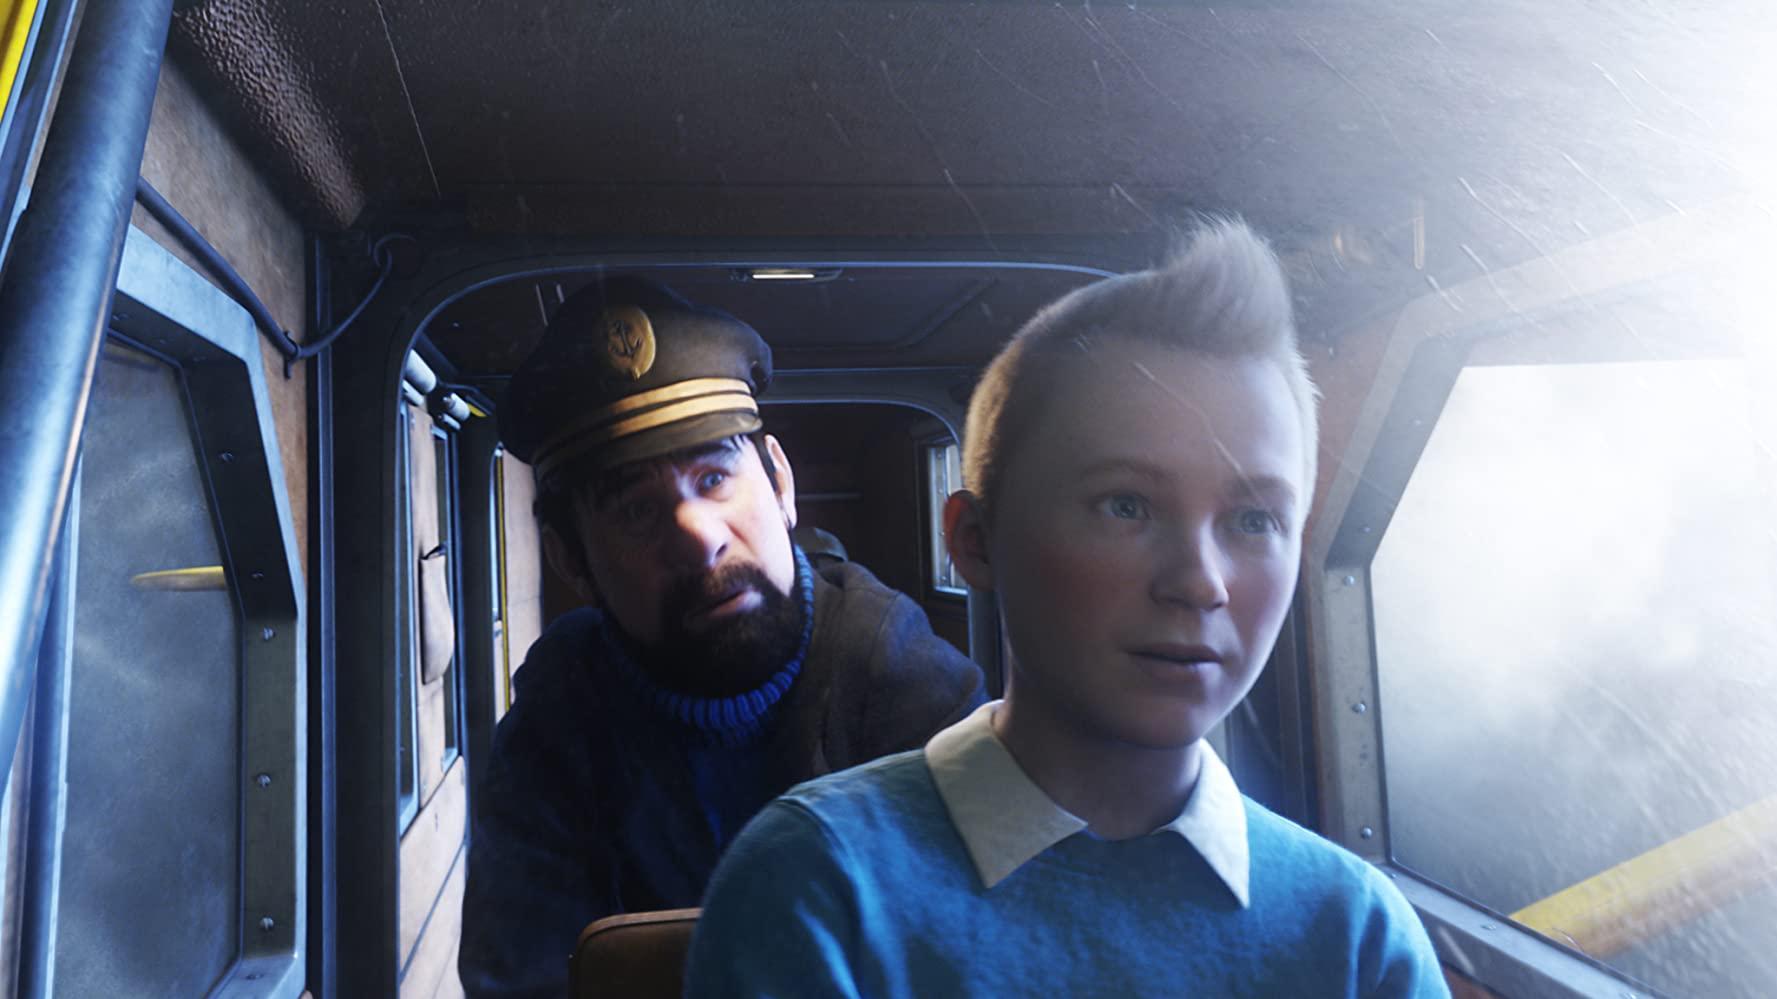 مشاهدة فيلم The Adventures of Tintin (2011) مترجم HD اون لاين